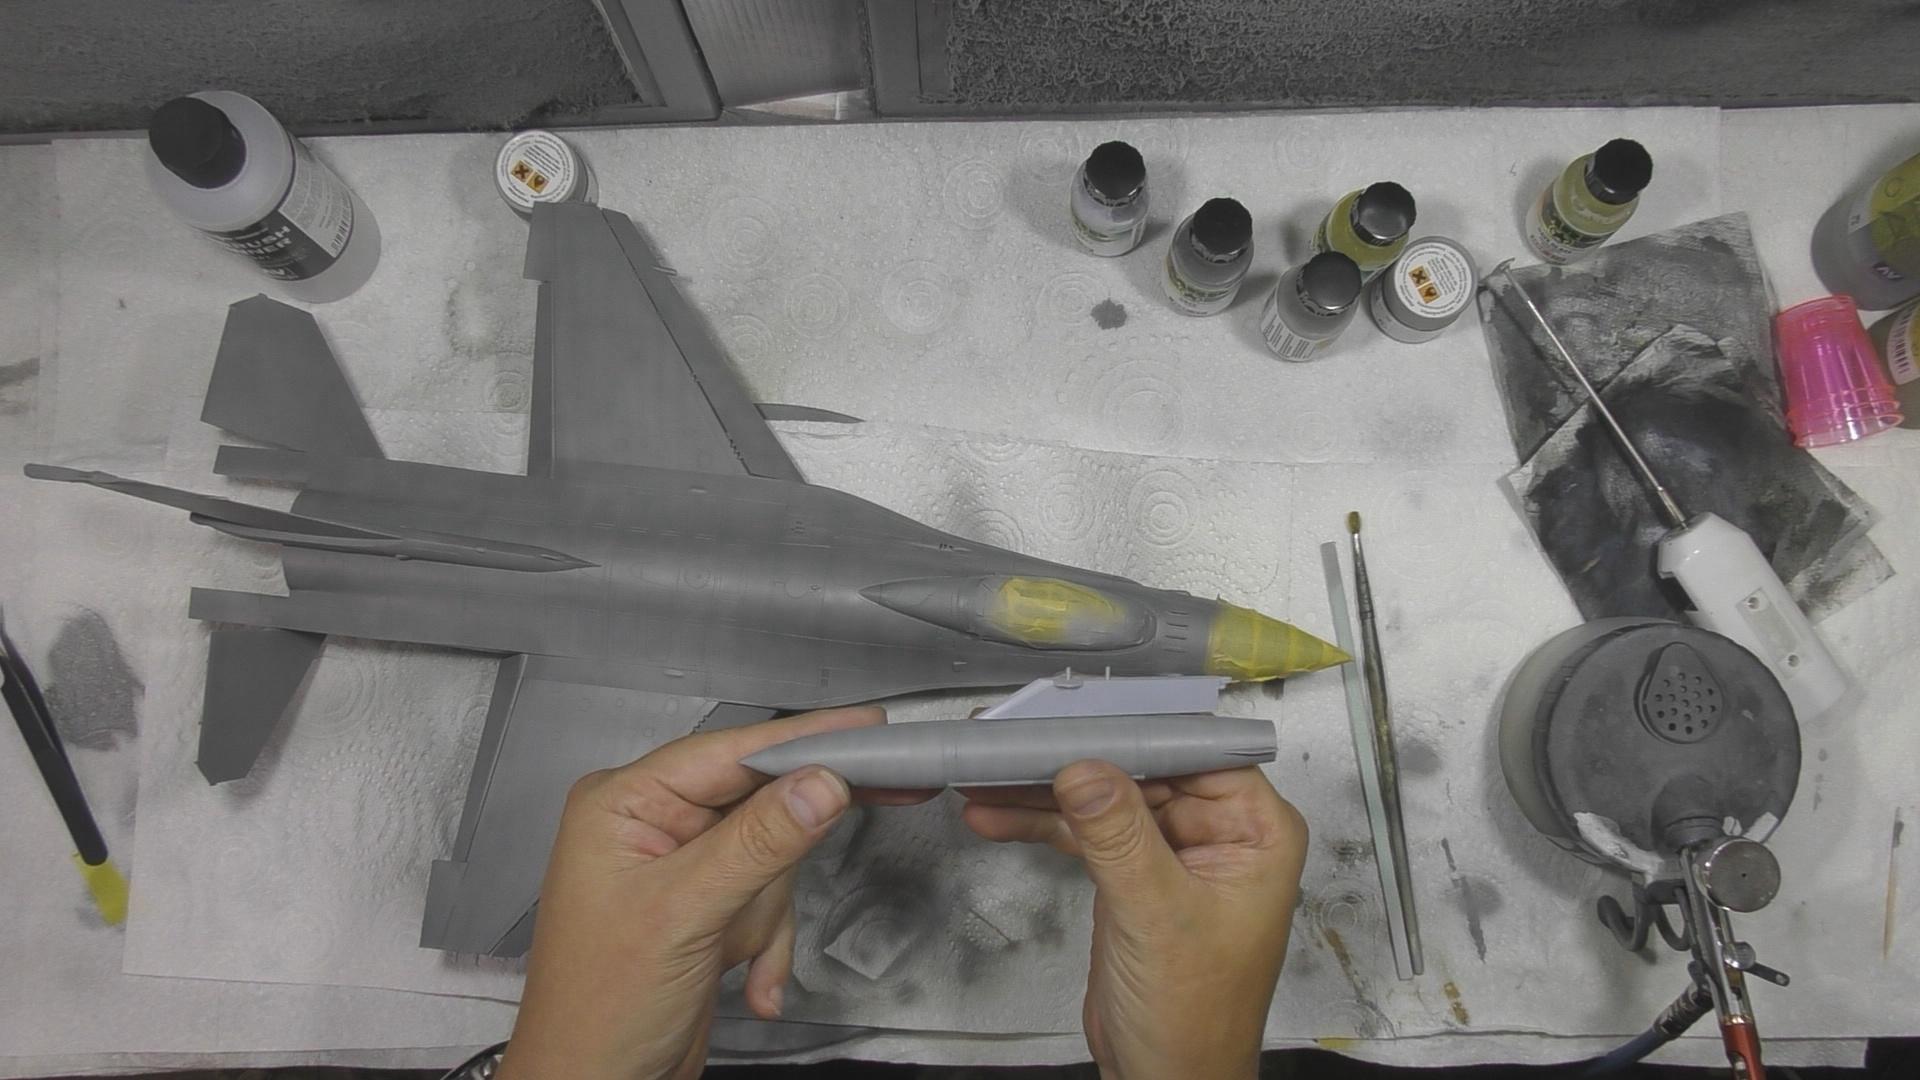 Tamiya F16 Part 9 Pic 3.jpg